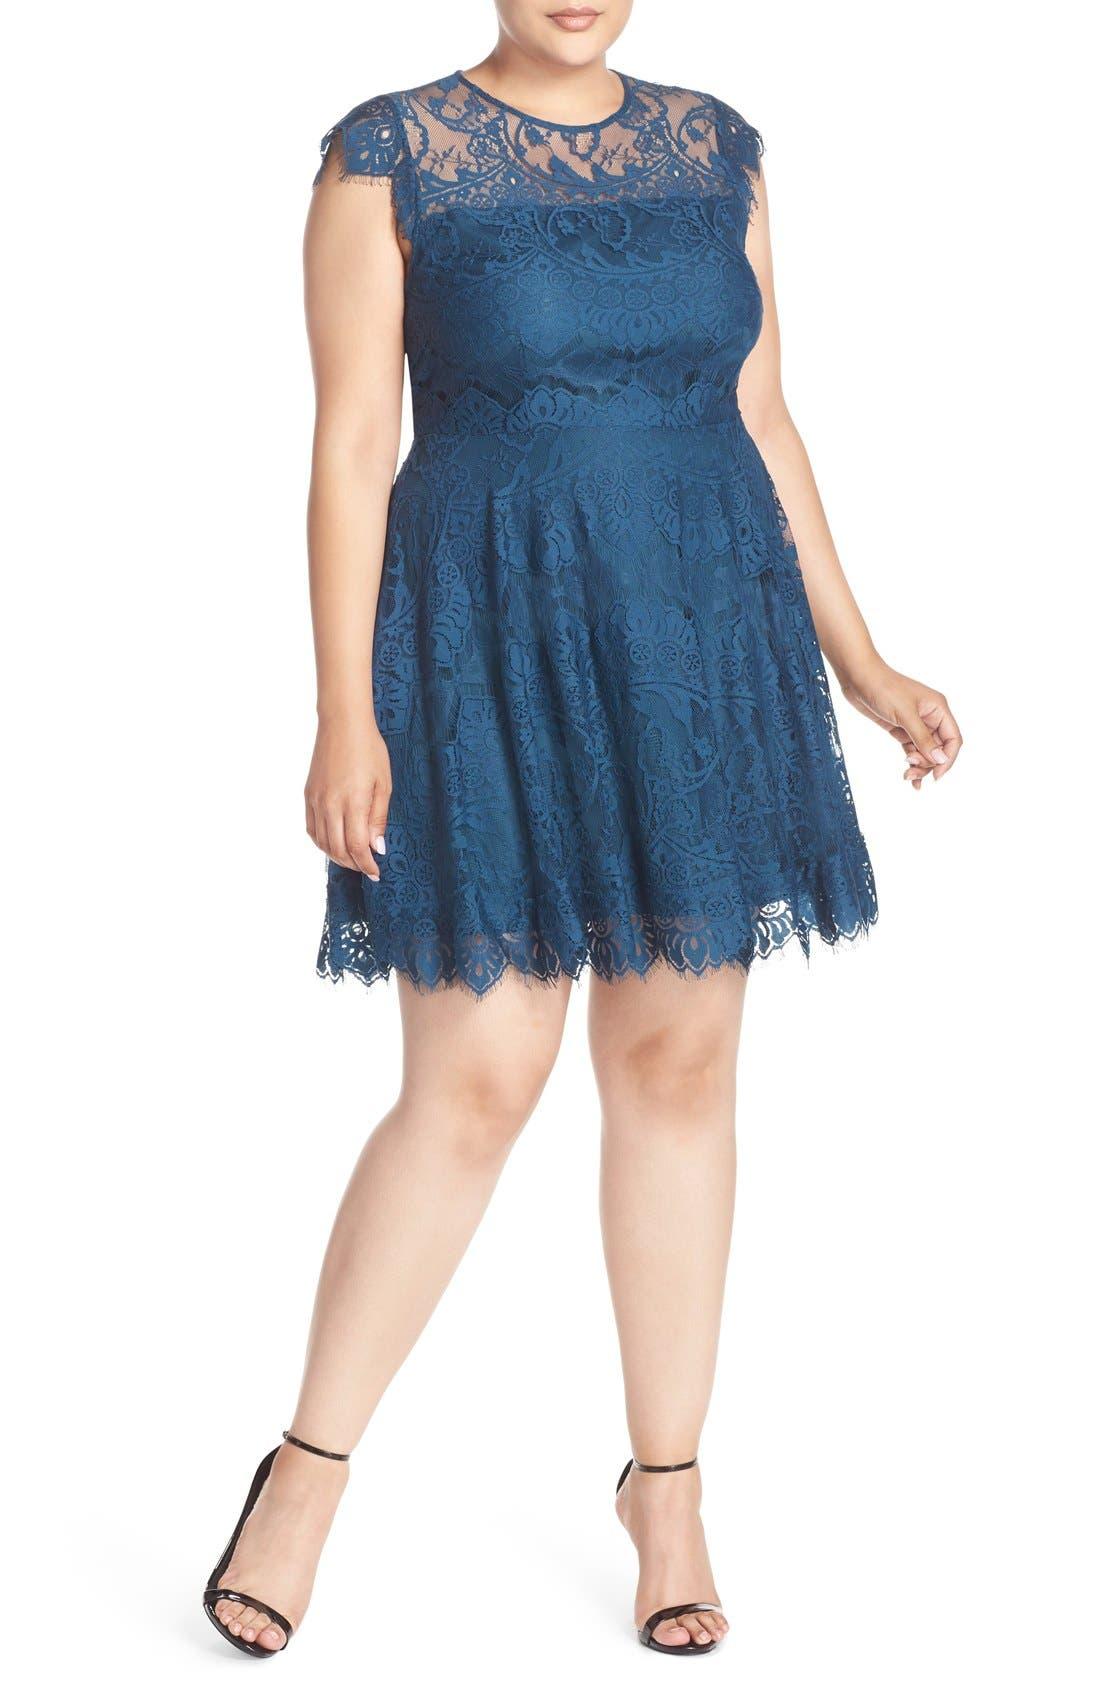 Main Image - BB Dakota 'Rhianna' Lace Fit & Flare Dress (Plus Size)